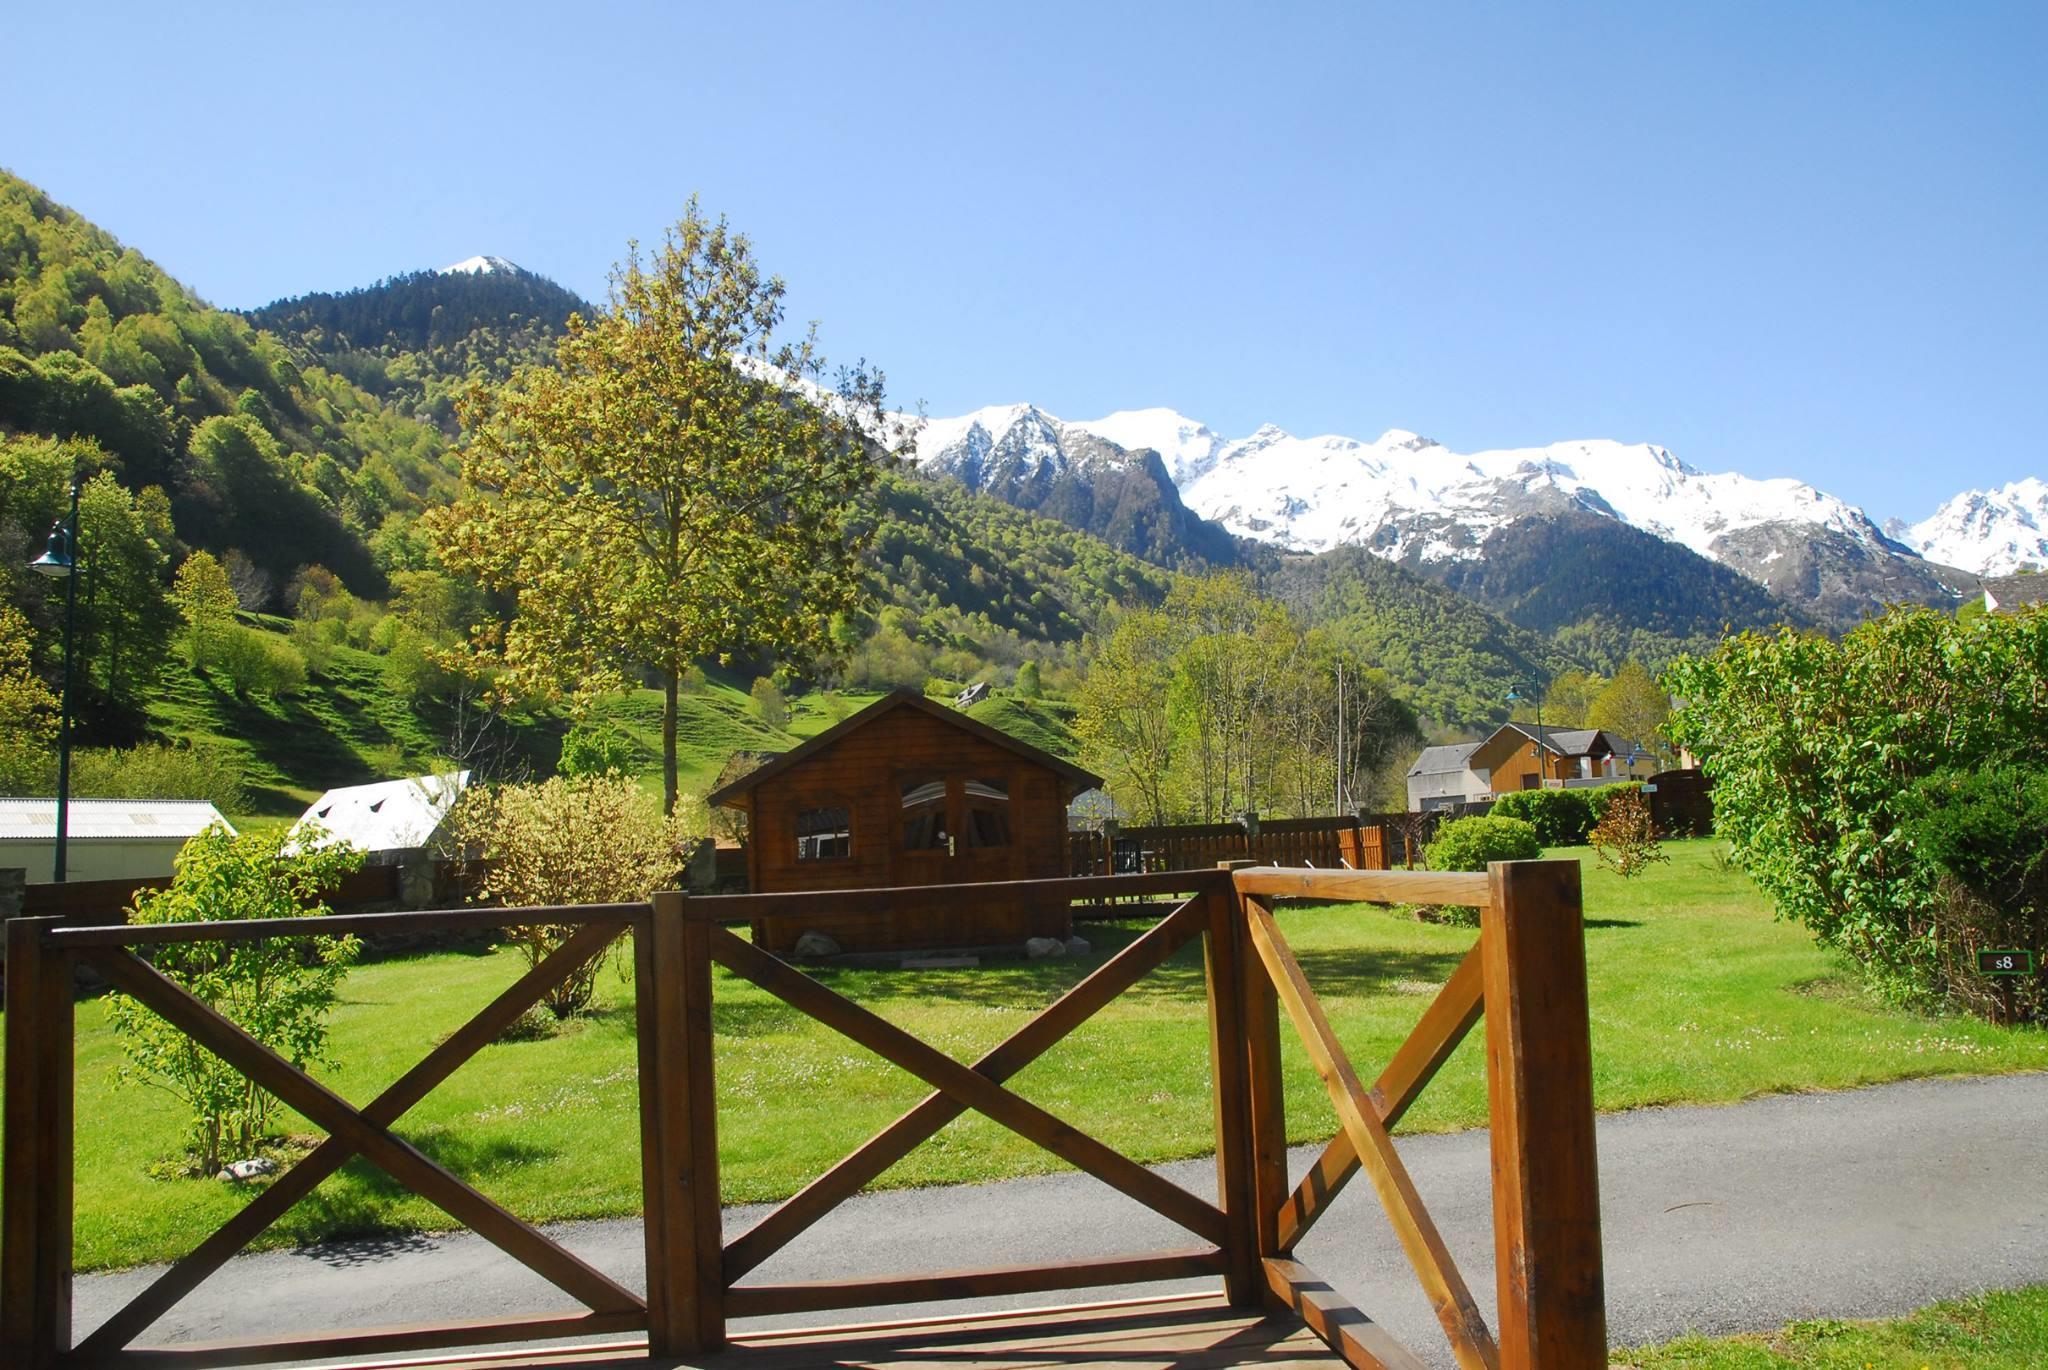 Camping Pyrenees Natura, Estaing, Hautes-Pyrénées